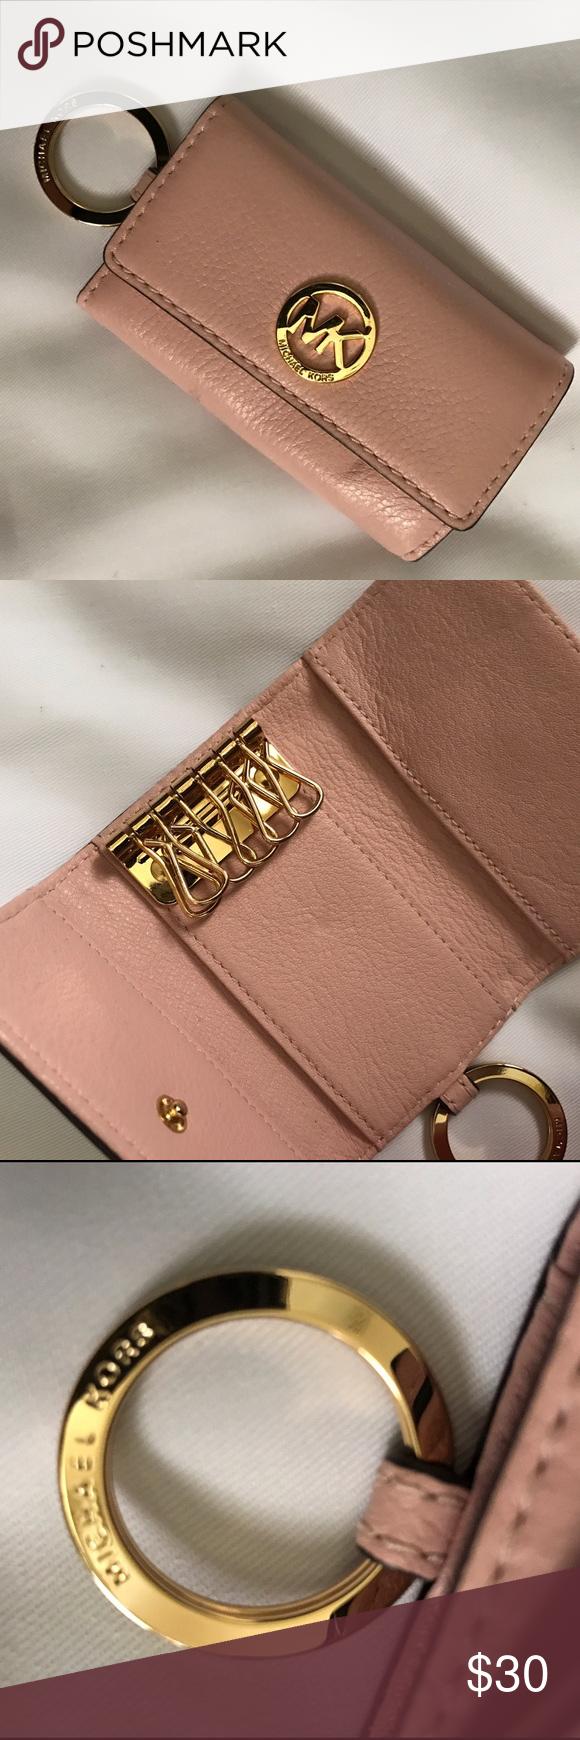 c7d02f5cc3cd Michael Kors Multiple Key Holder Baby pink leather key chain wallet. Gold  hardware. Slight mark